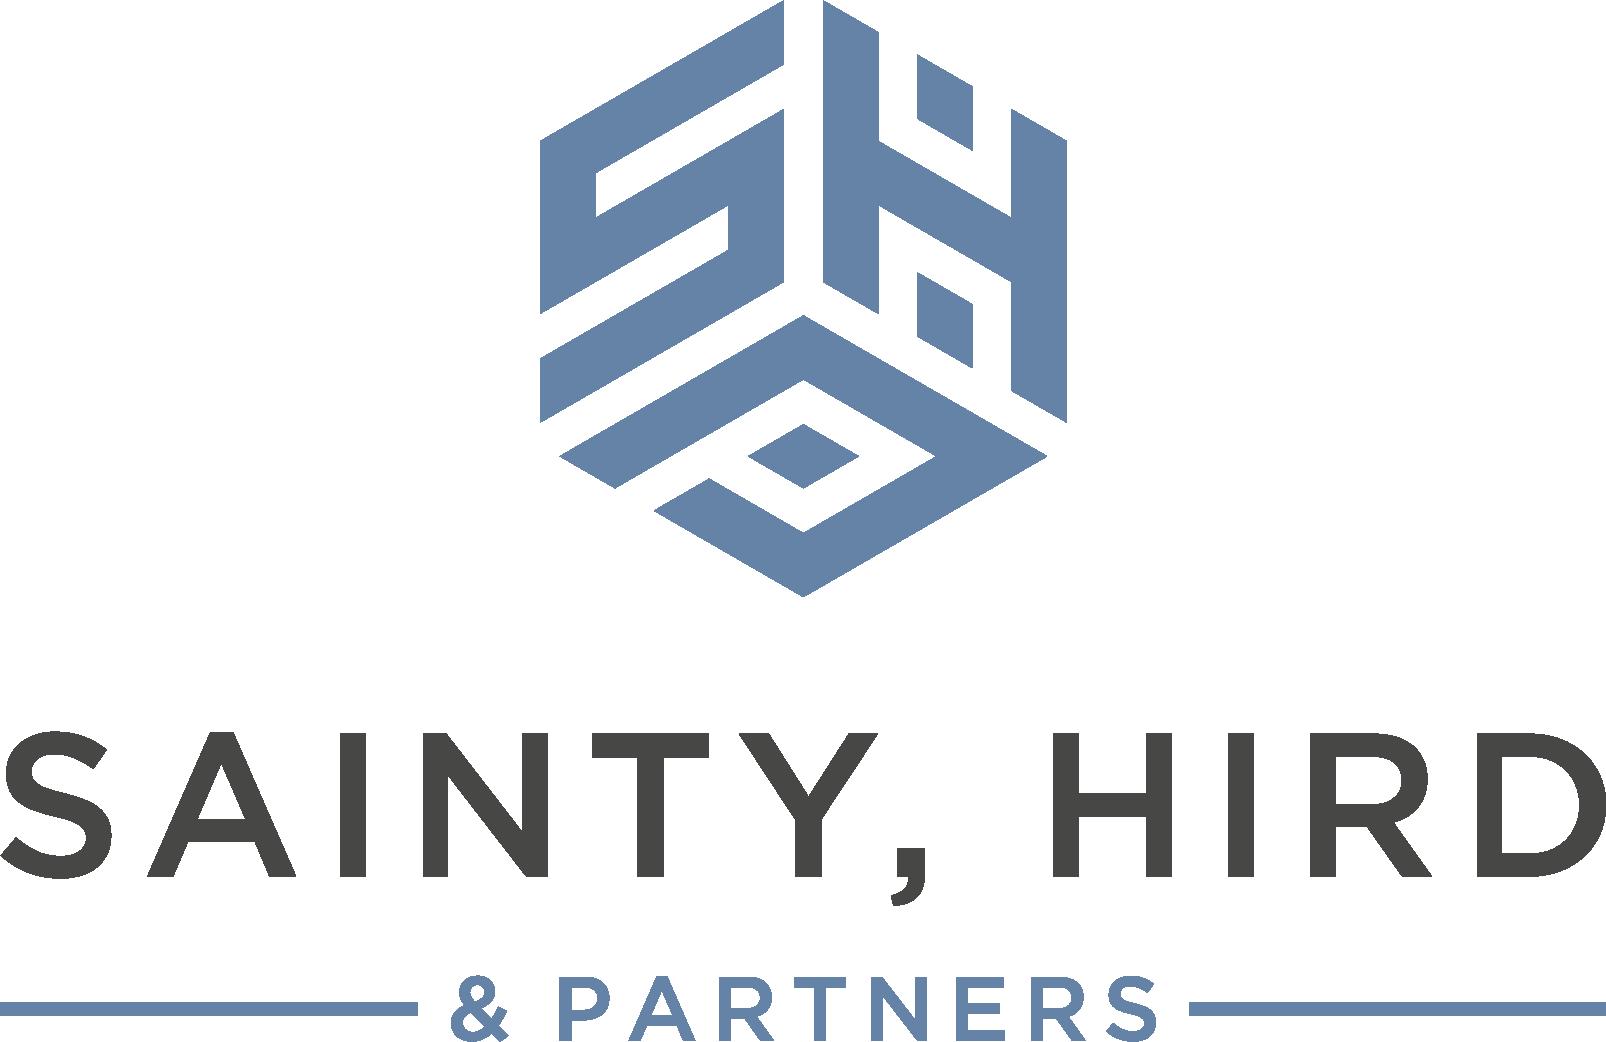 Sainty, Hird & Partners logo